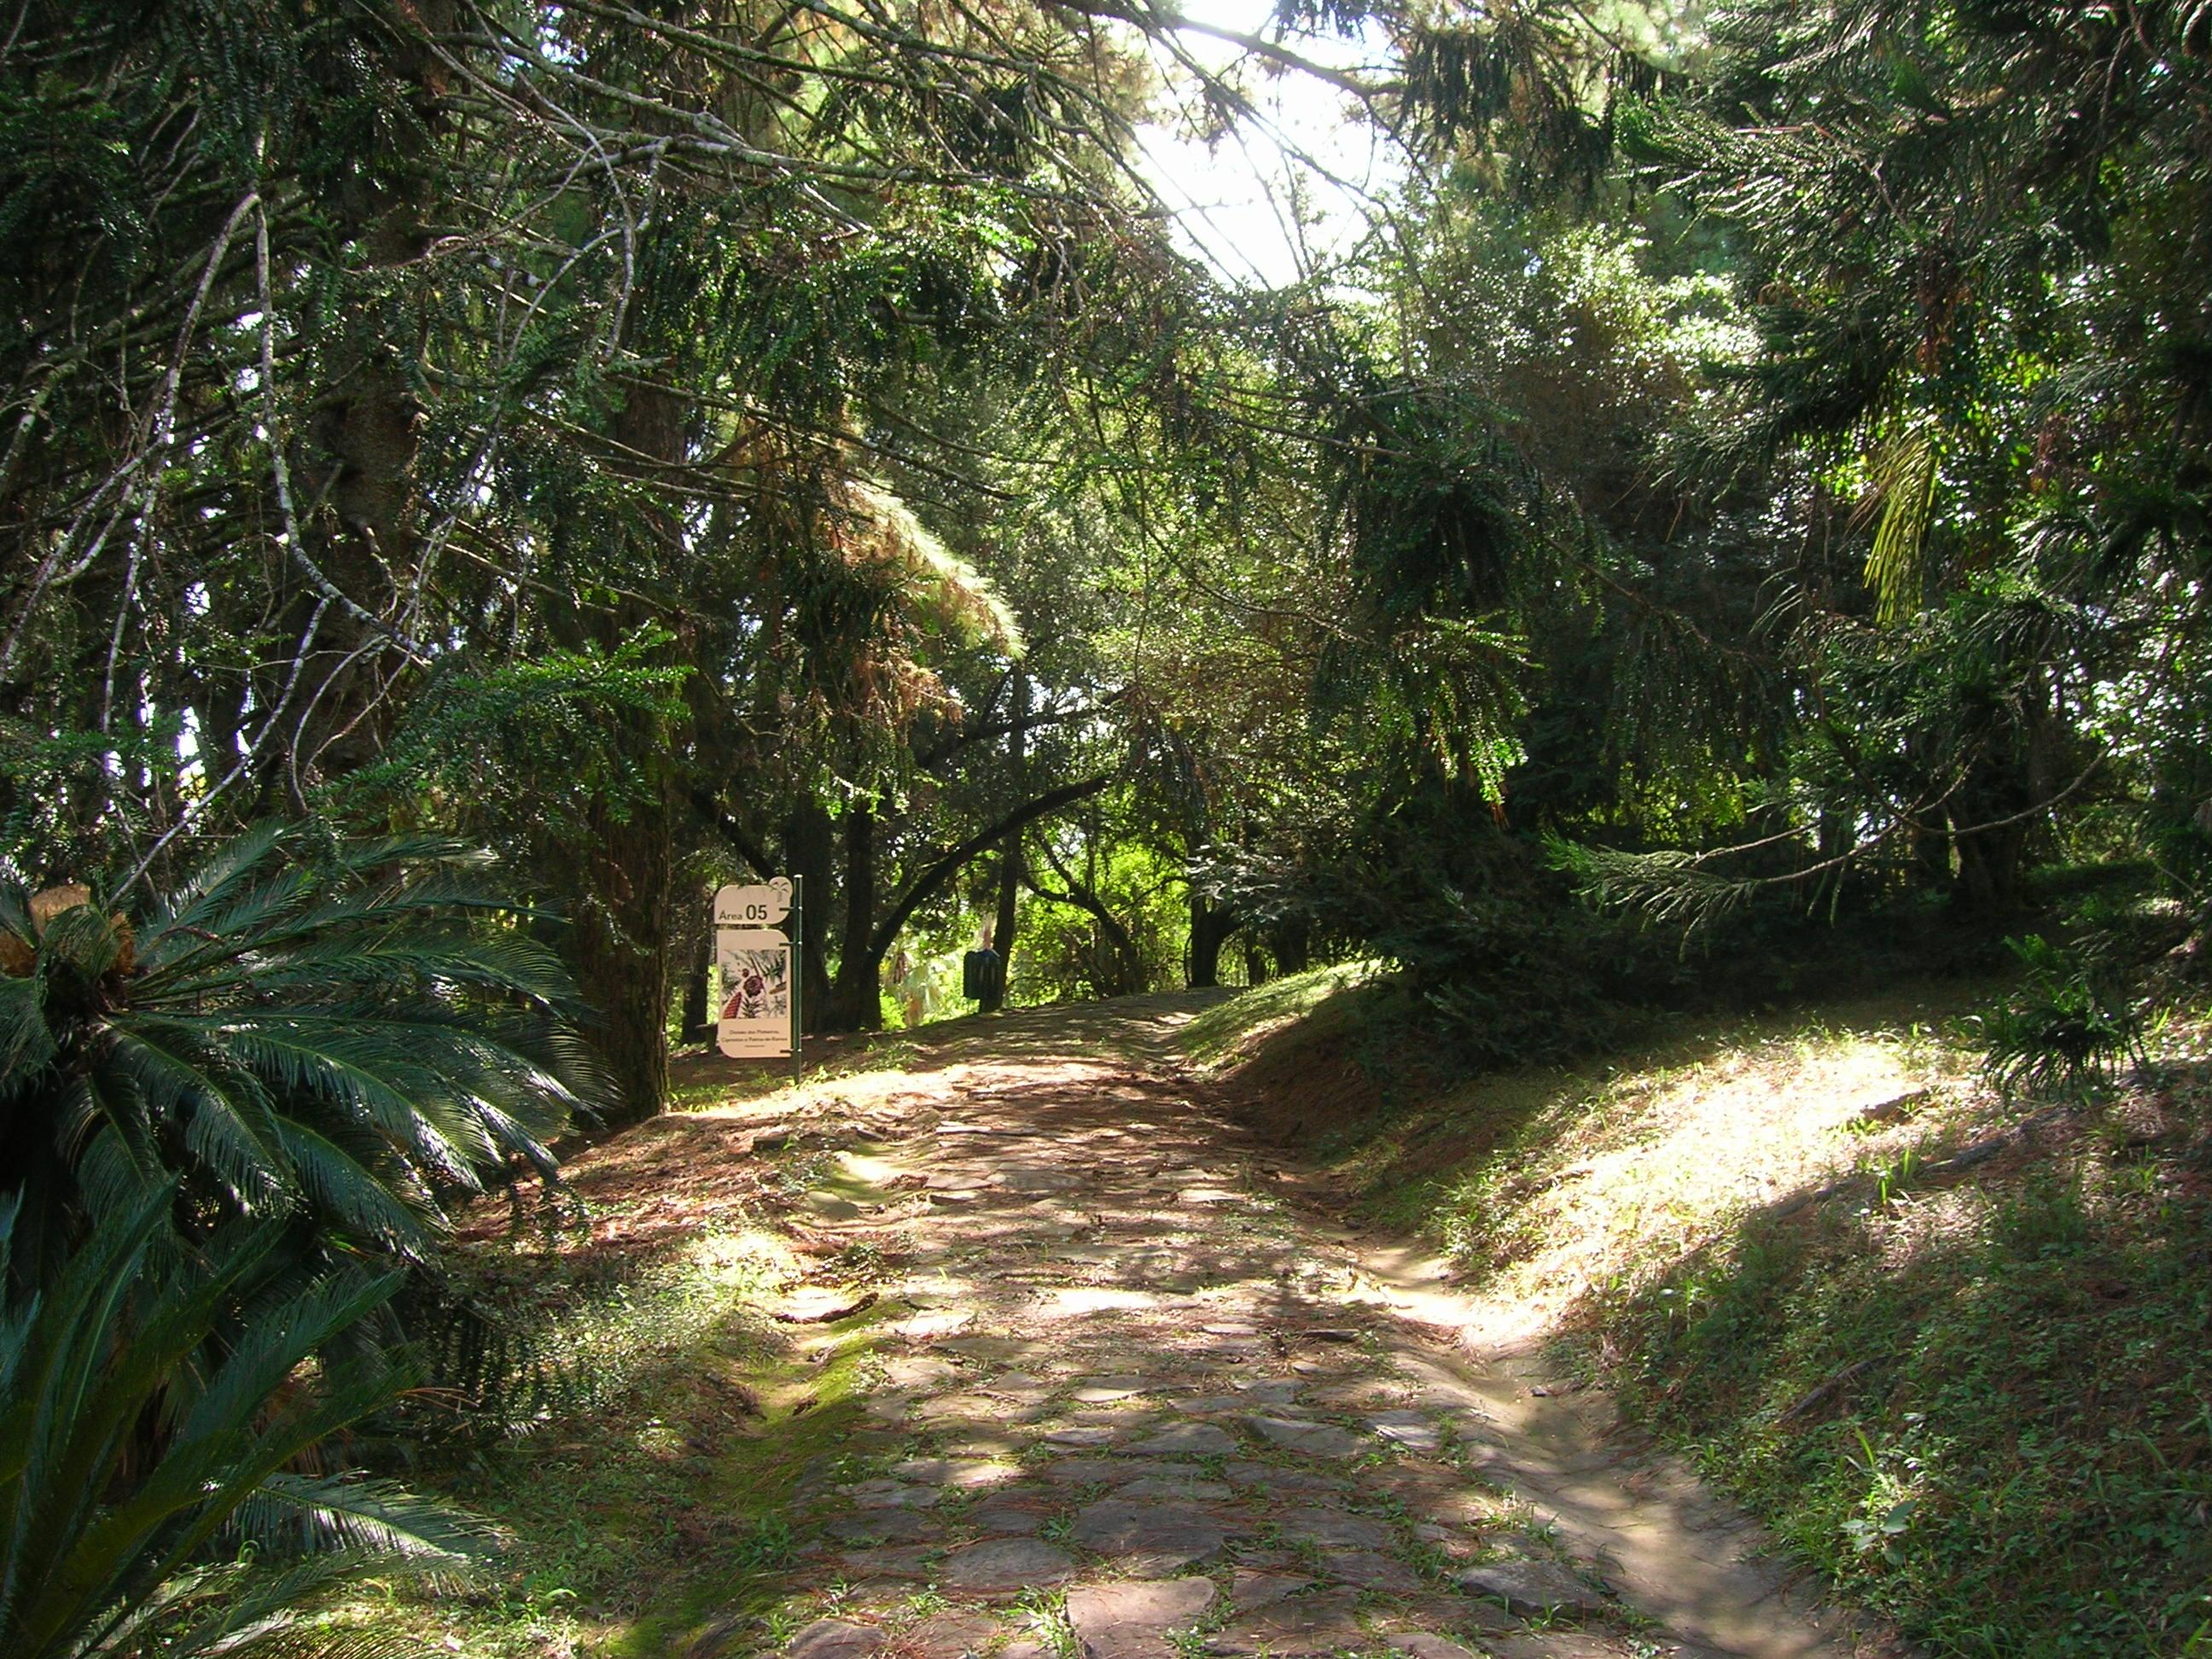 fotos jardim botanico porto alegre : fotos jardim botanico porto alegre:File:Área cinco jardim botânico porto alegre.JPG – Wikimedia Commons